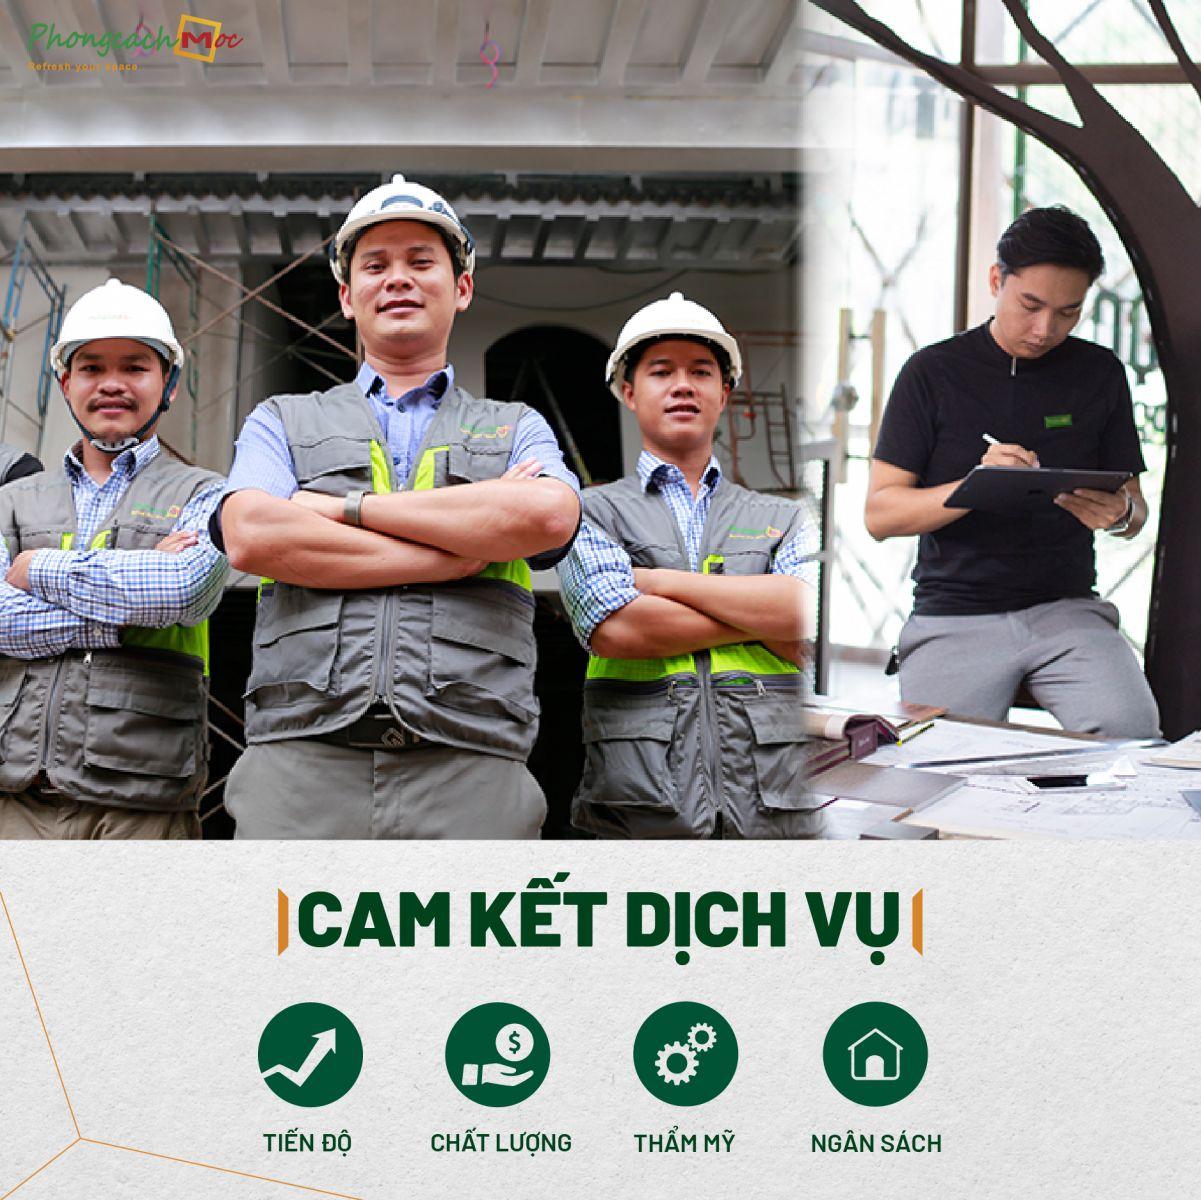 cam-ket-dich-vu